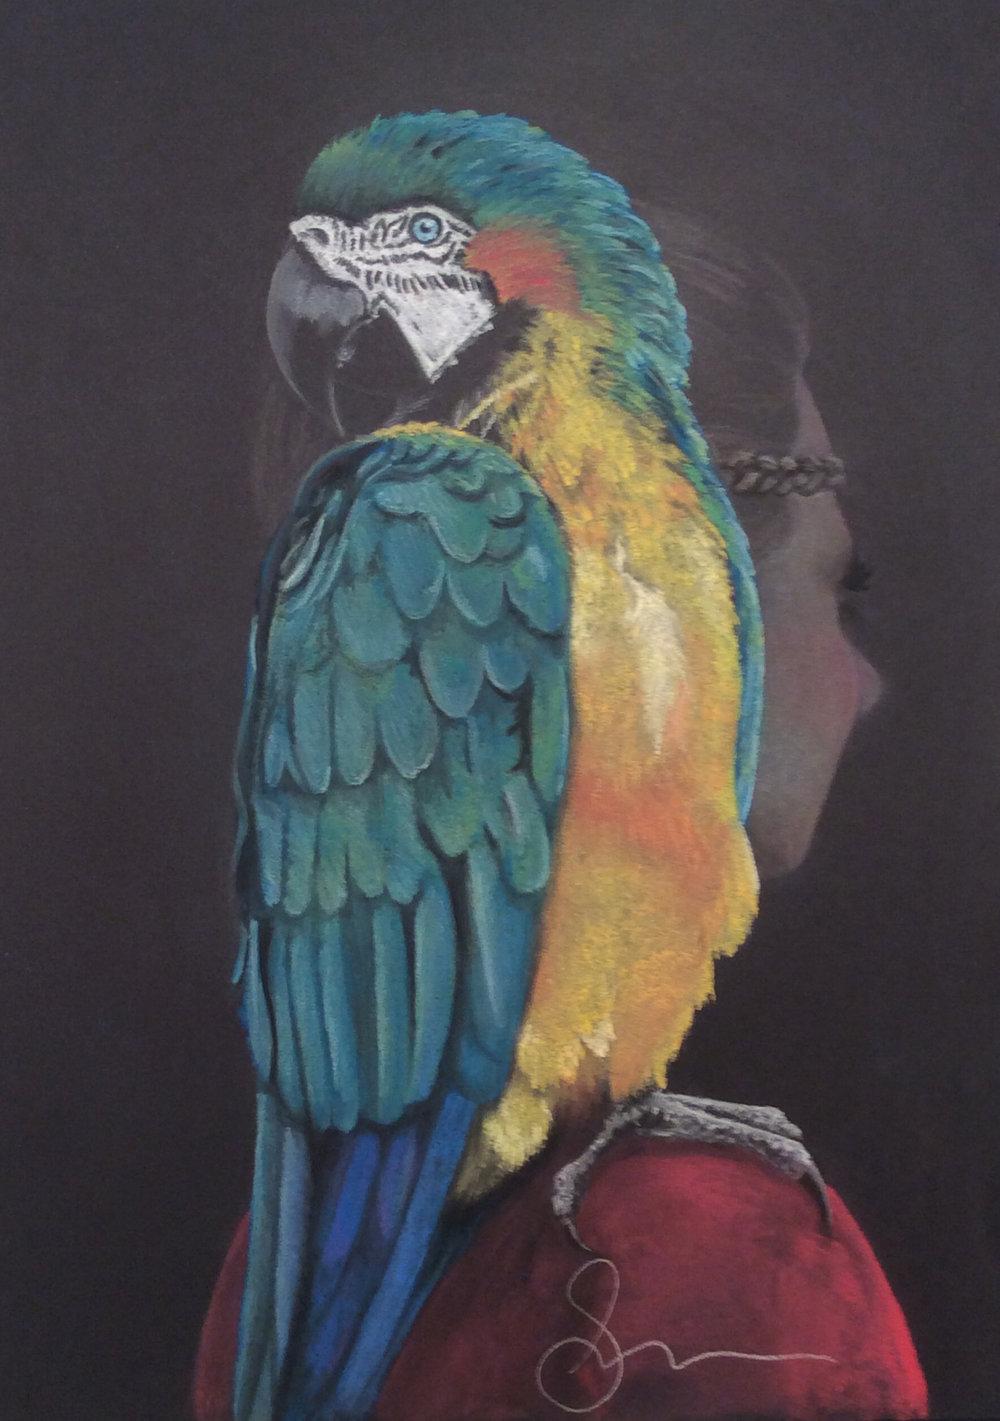 Suzanne Grover art 3 300dpi.jpg